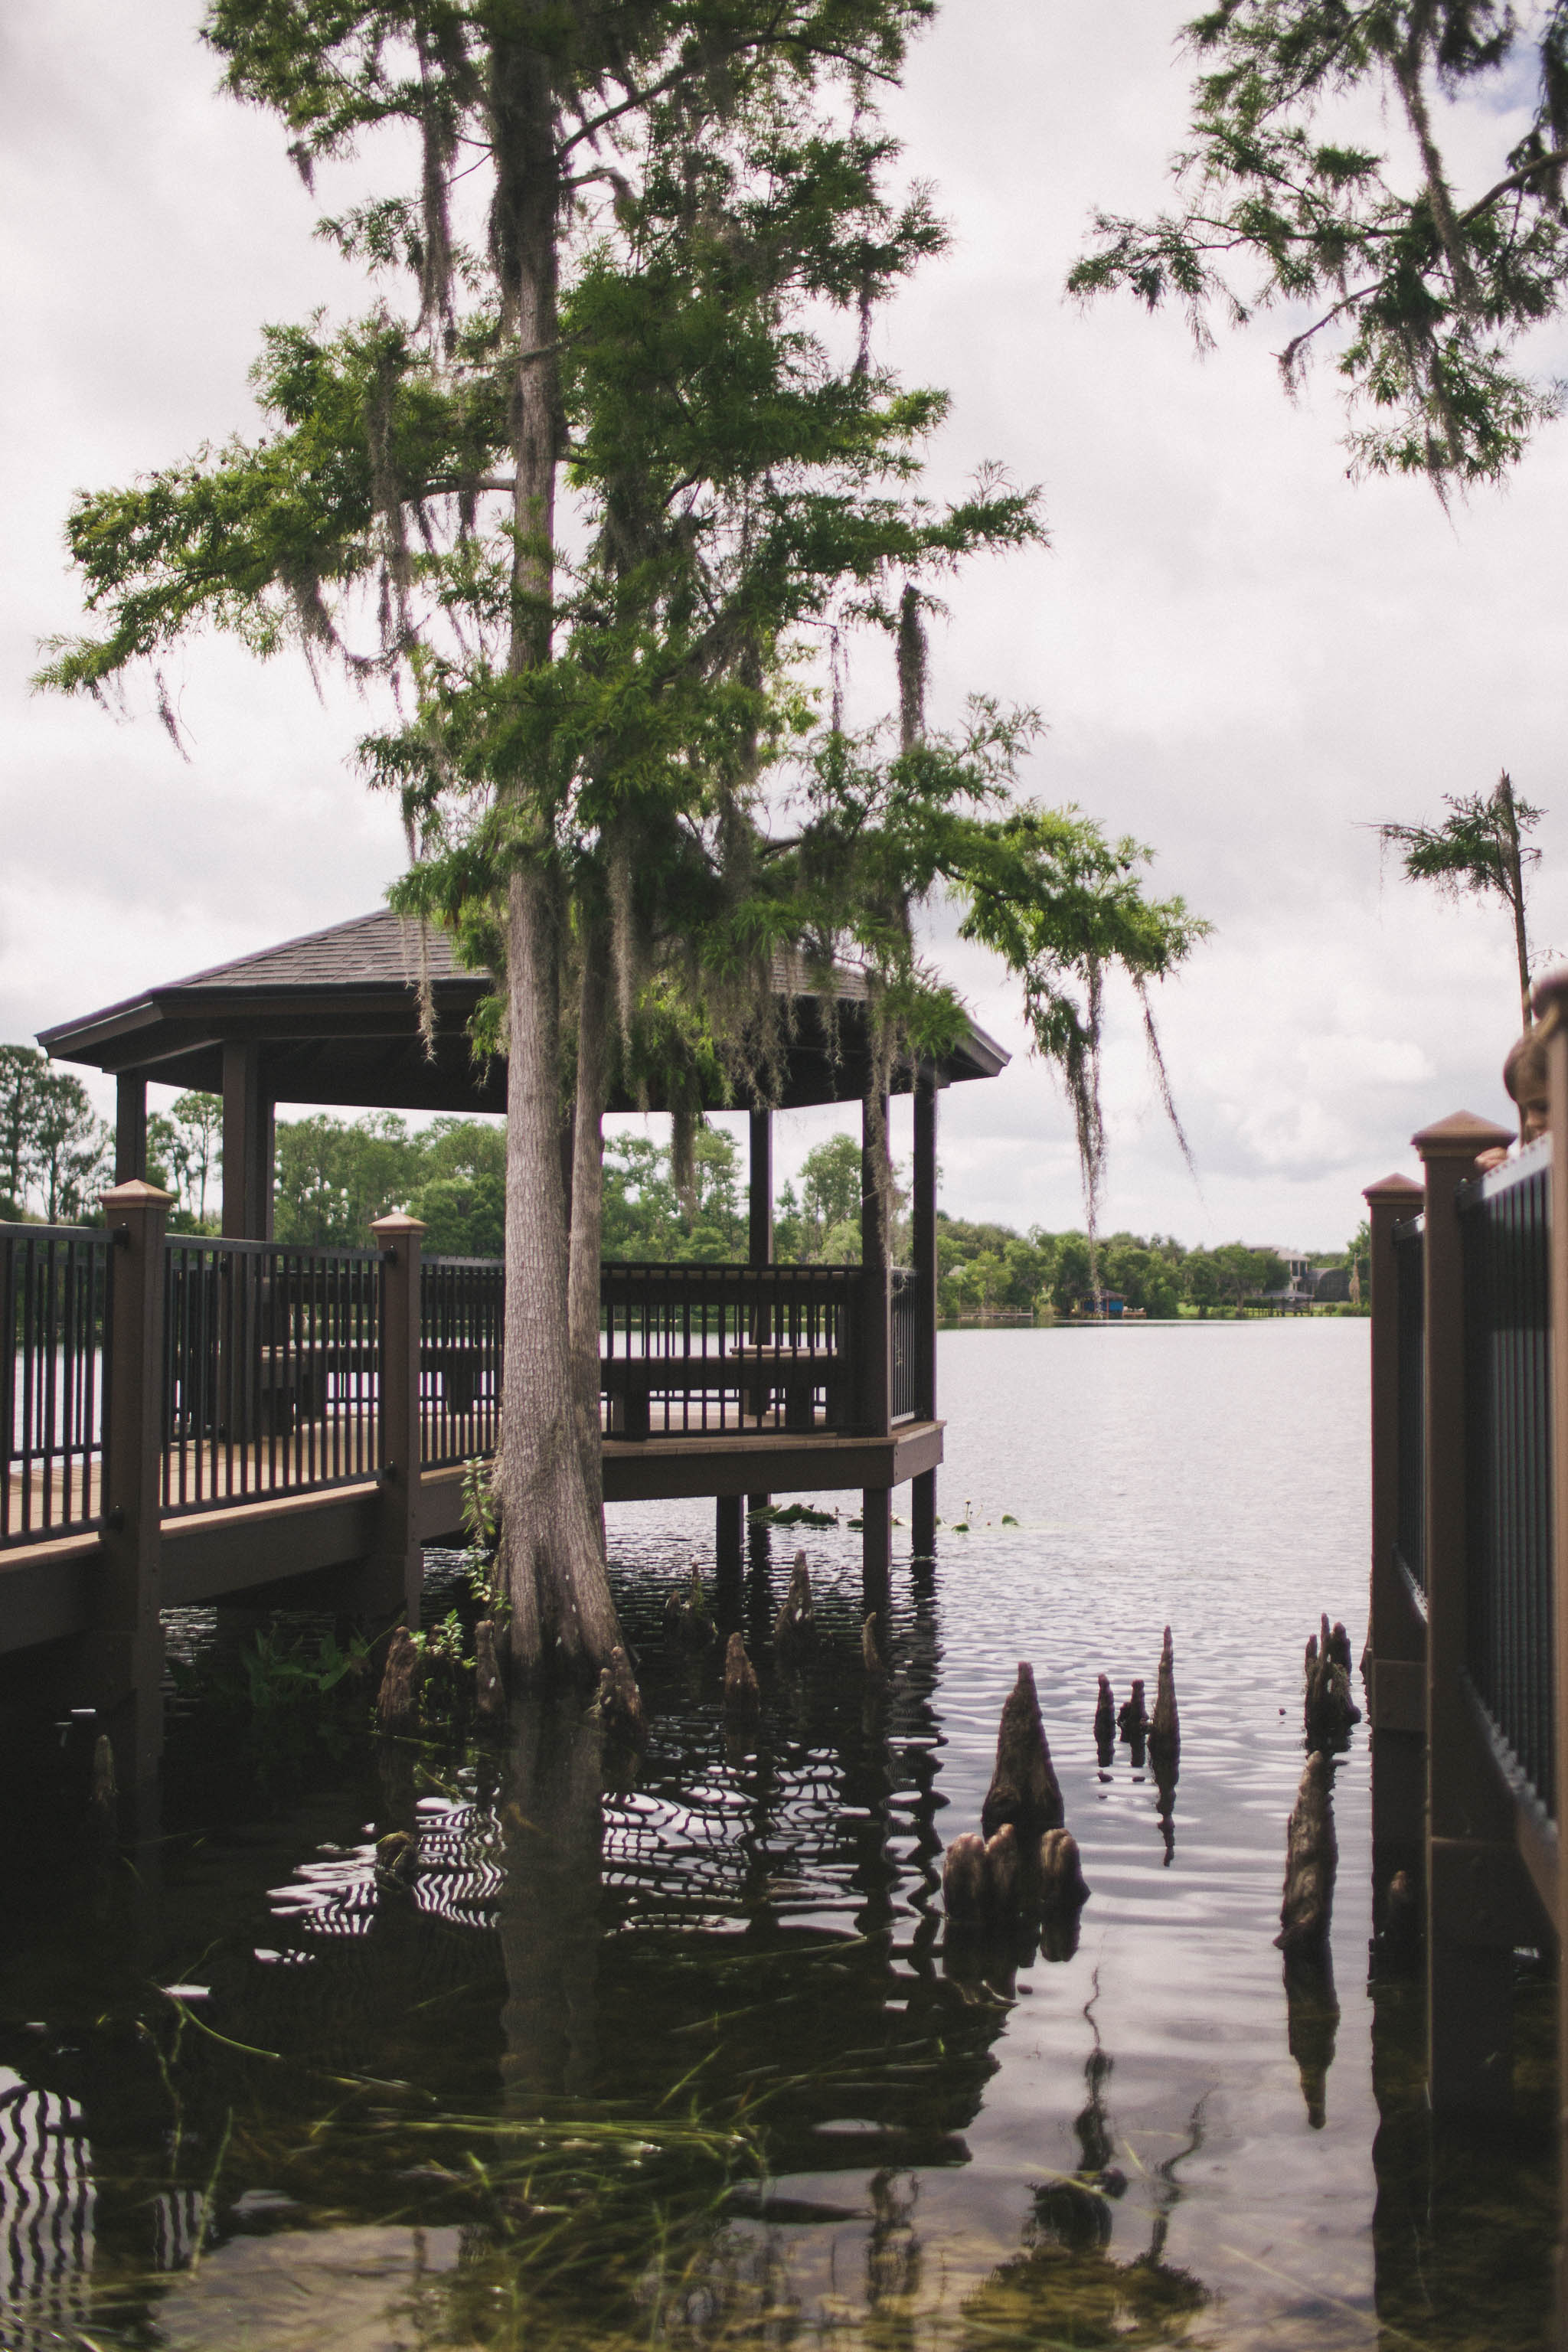 Florida-Lorraine-Yeung-7.jpg